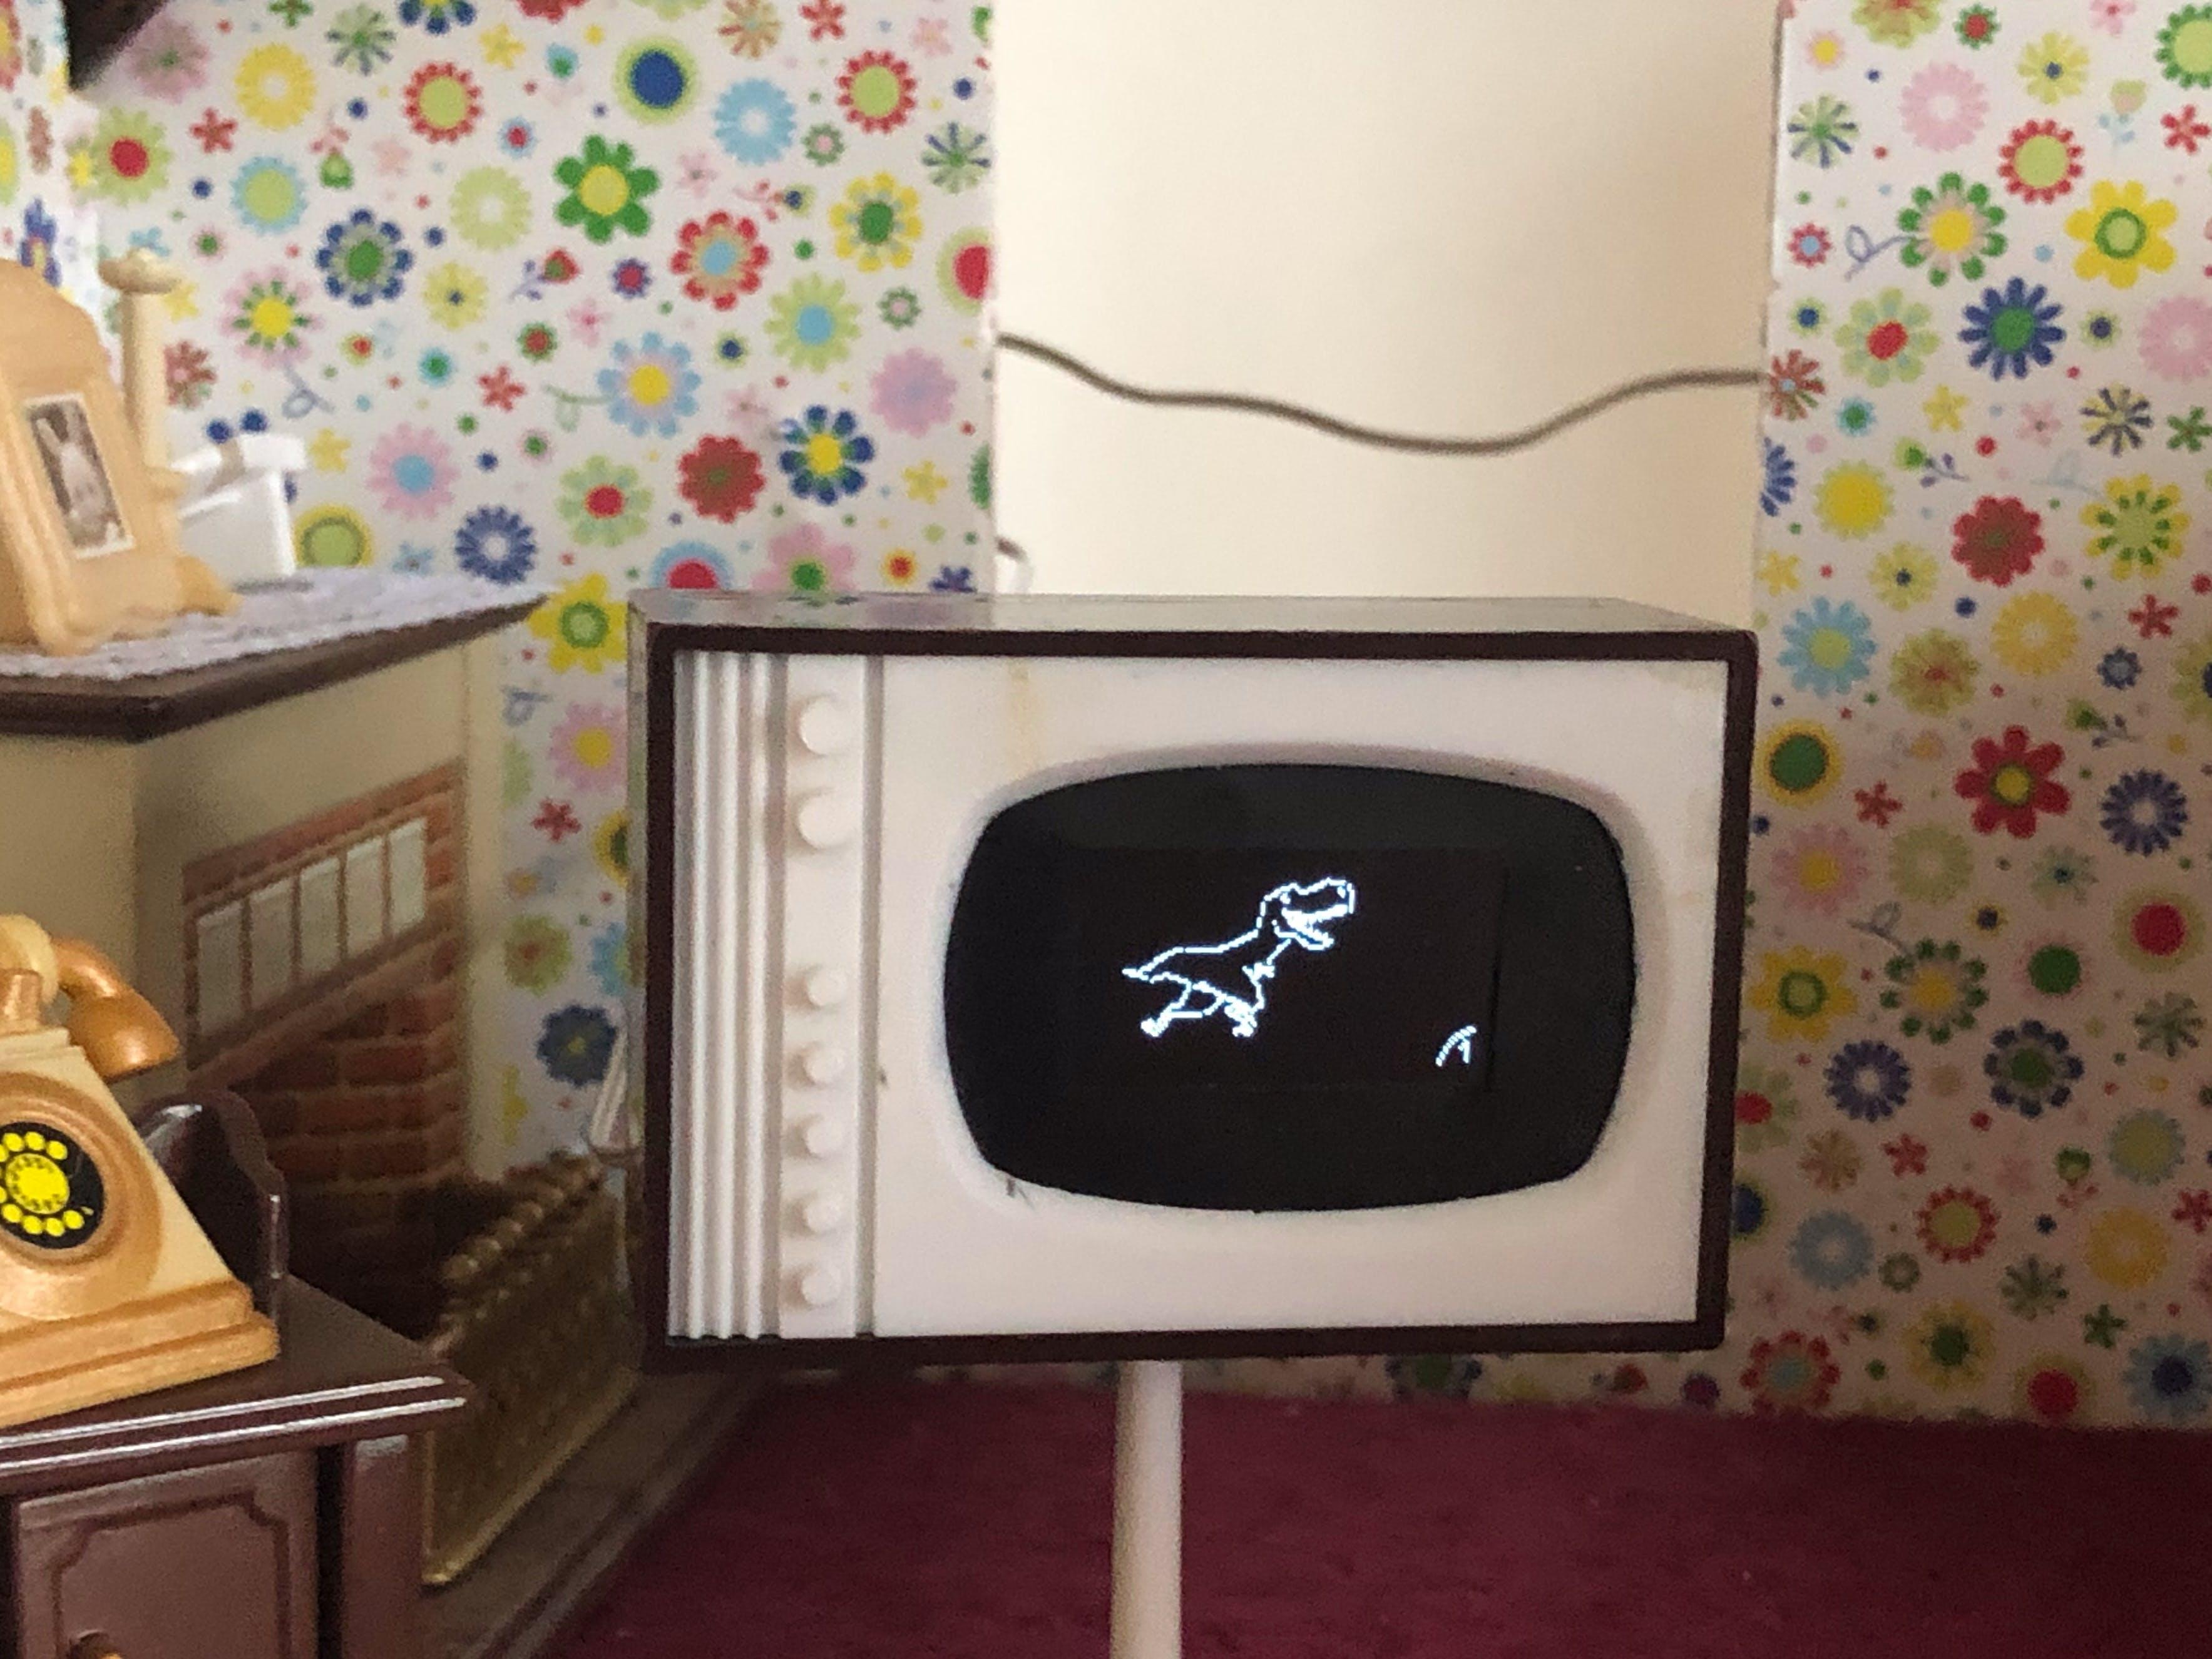 Arduino Dollhouse Mini TV